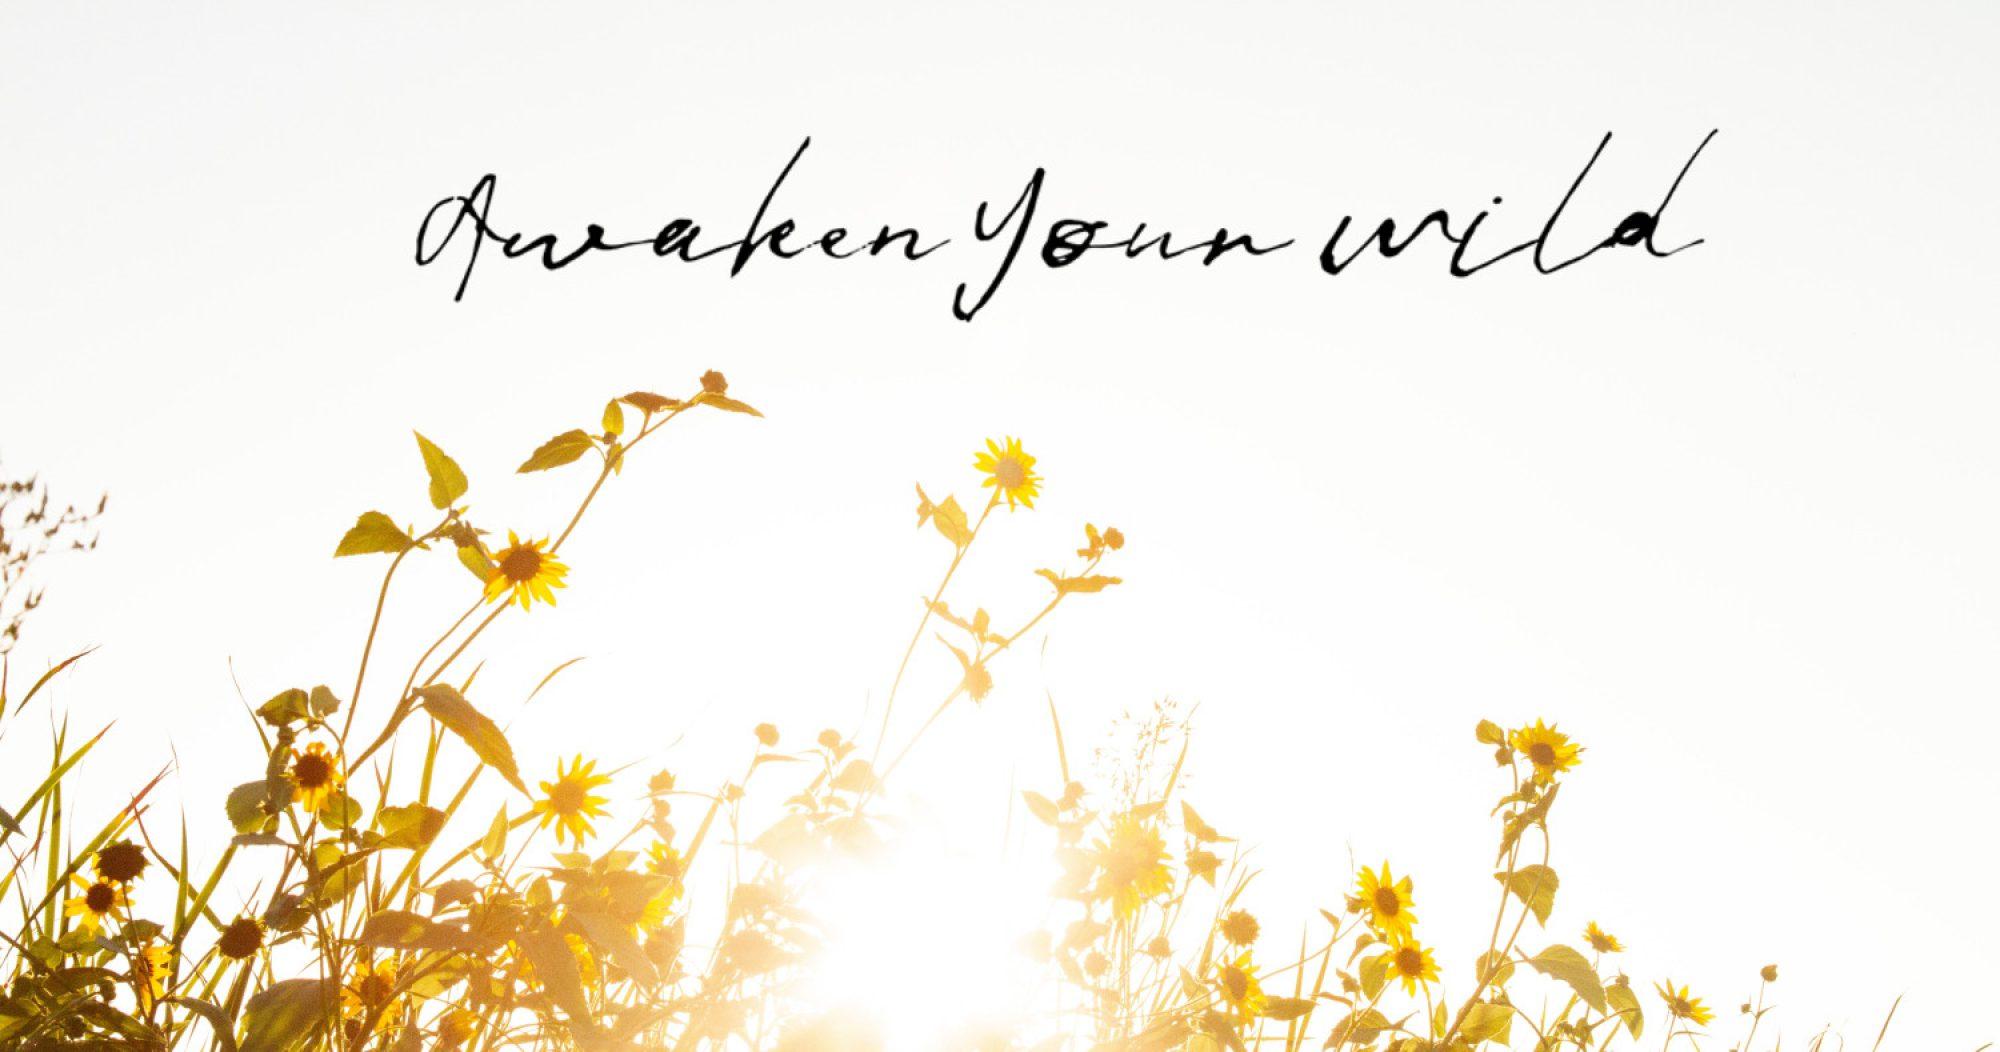 Awaken Your Wild